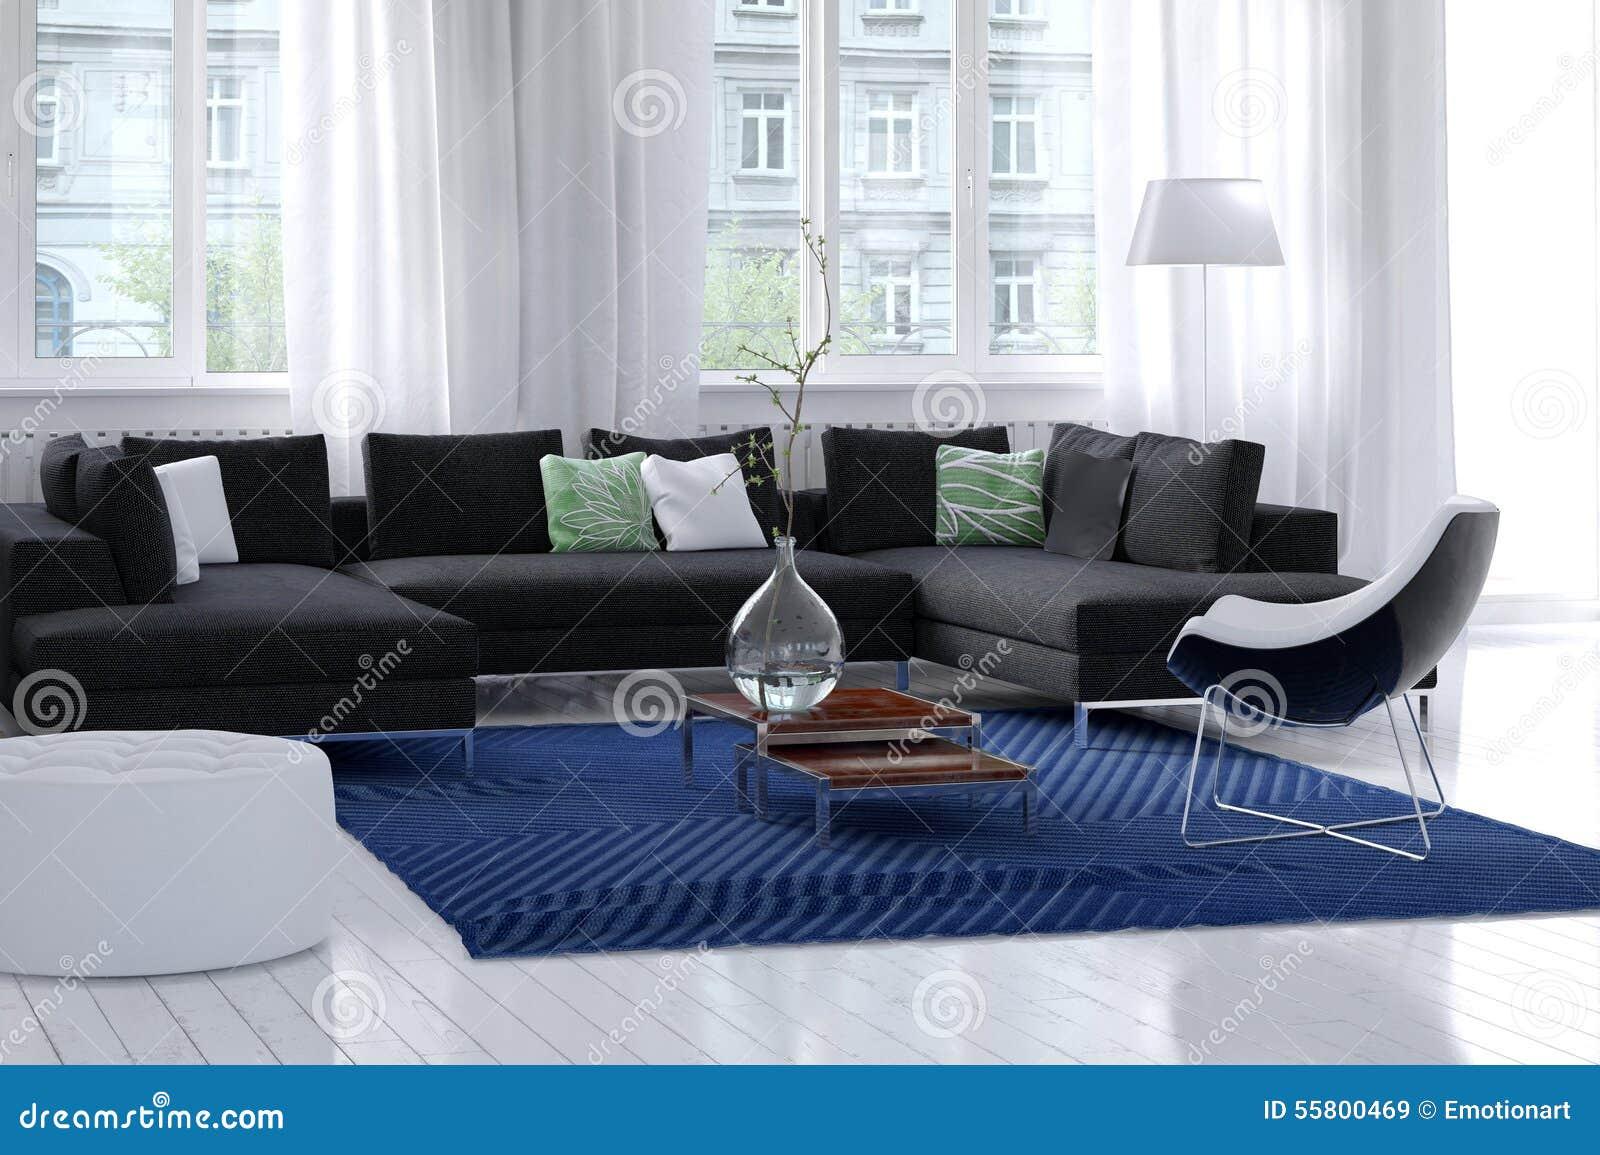 Bright airy modern living room interior